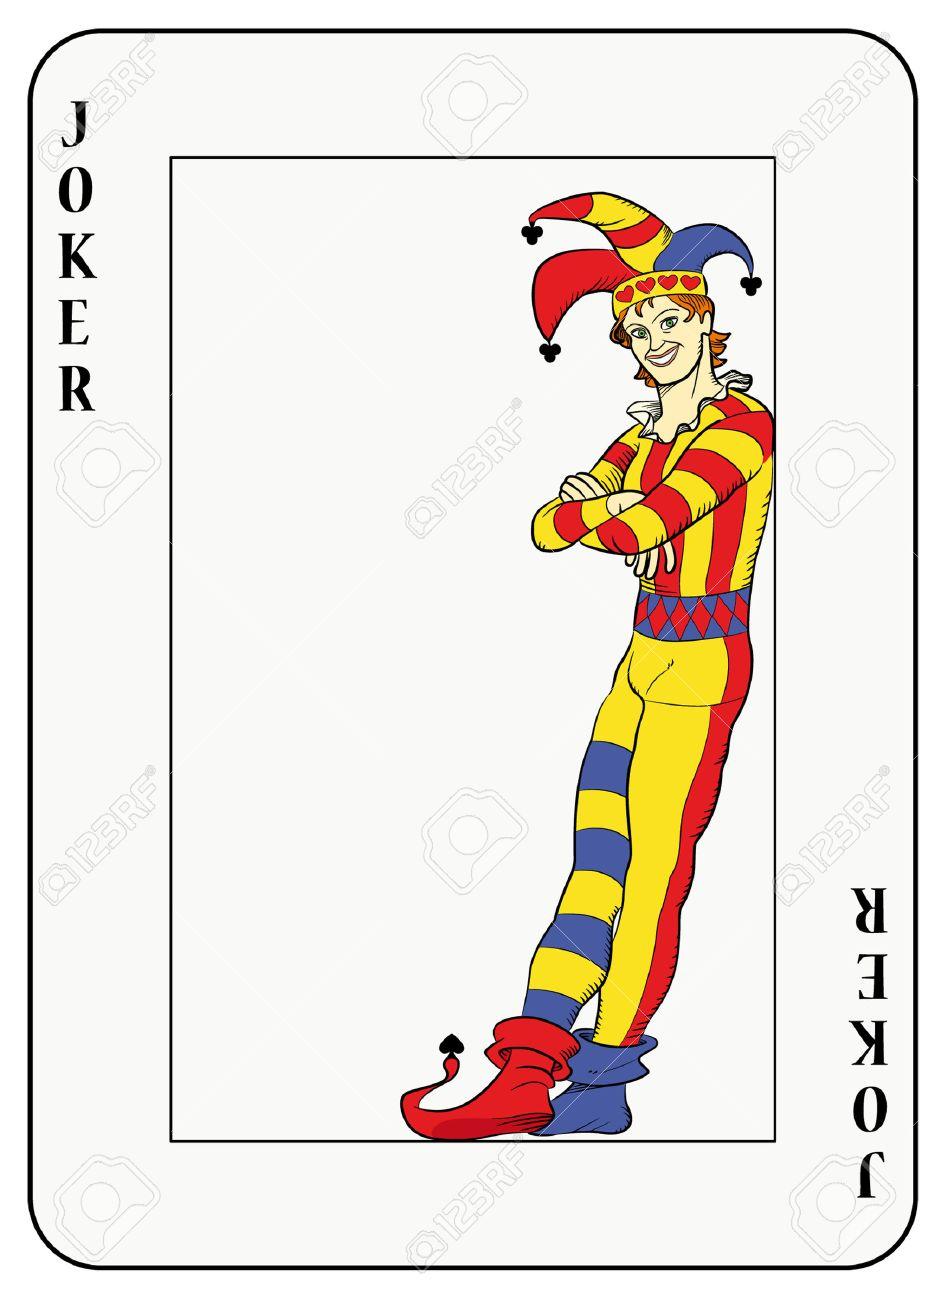 Joker leaning against playing card frame.